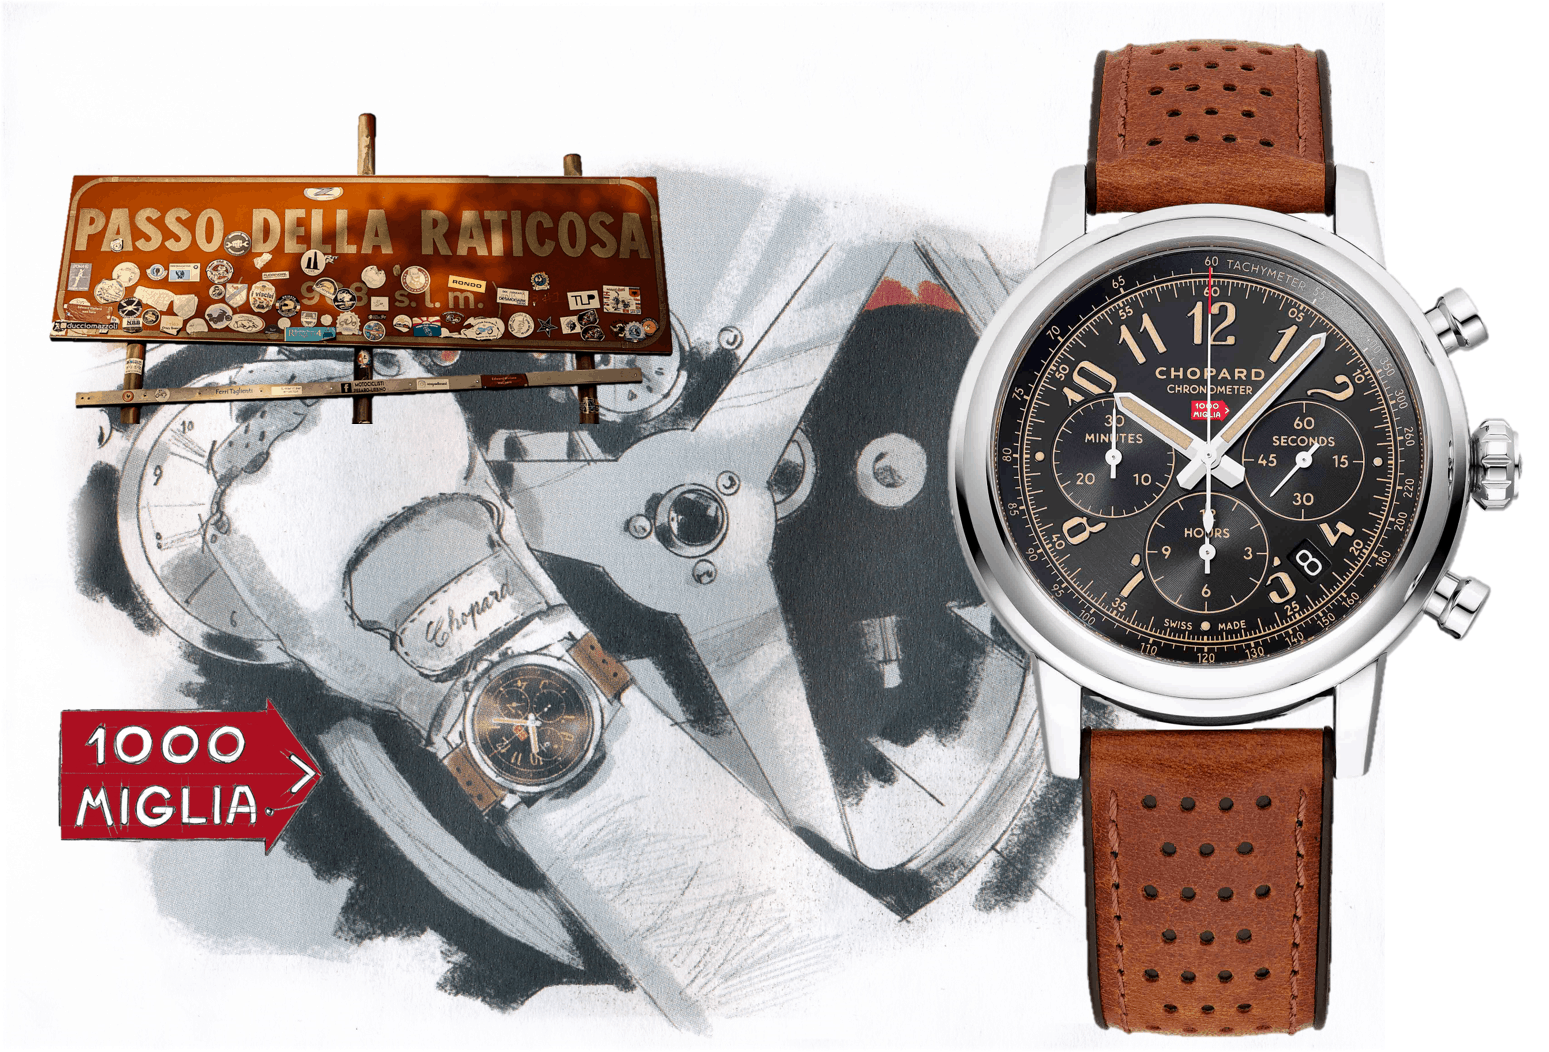 Chopard Mille Mille ChronographChopard Mille Miglia Classic Raticosa Chronograph: Die Sportive  Gentleman-Uhr